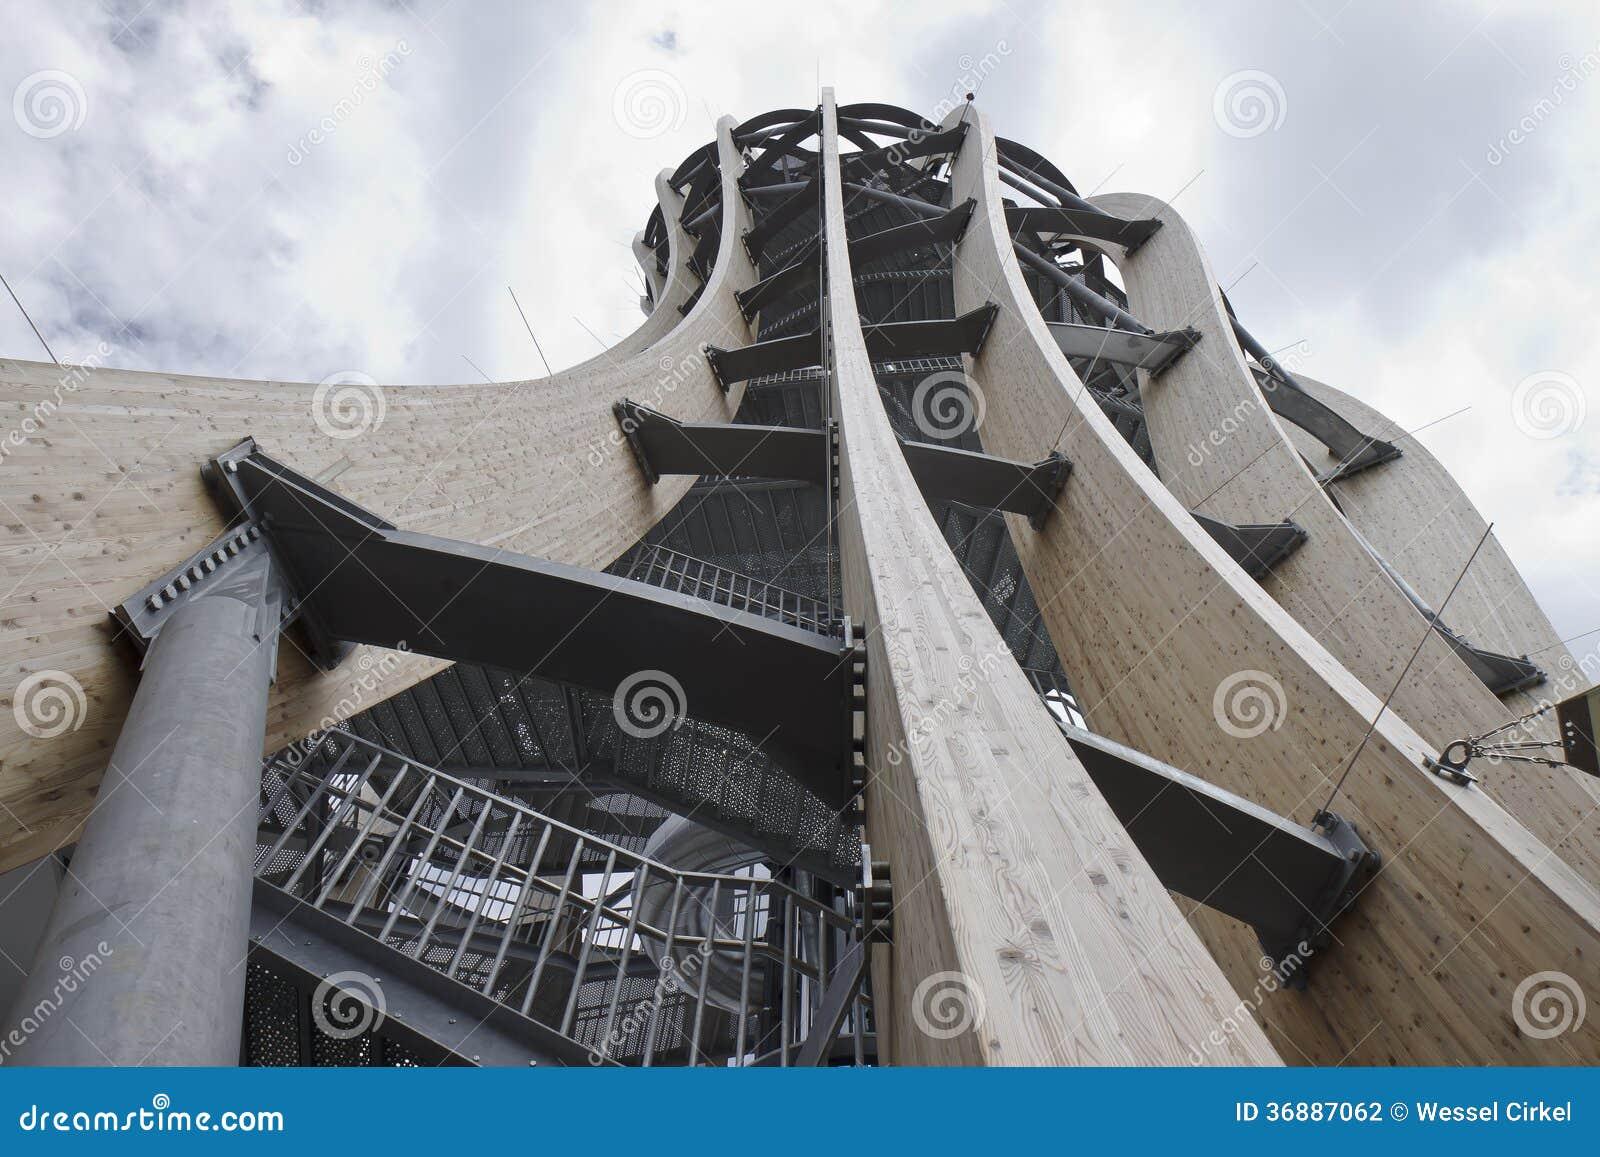 Pyramidekogel Tower Klagenfurt Austria Stock Photography